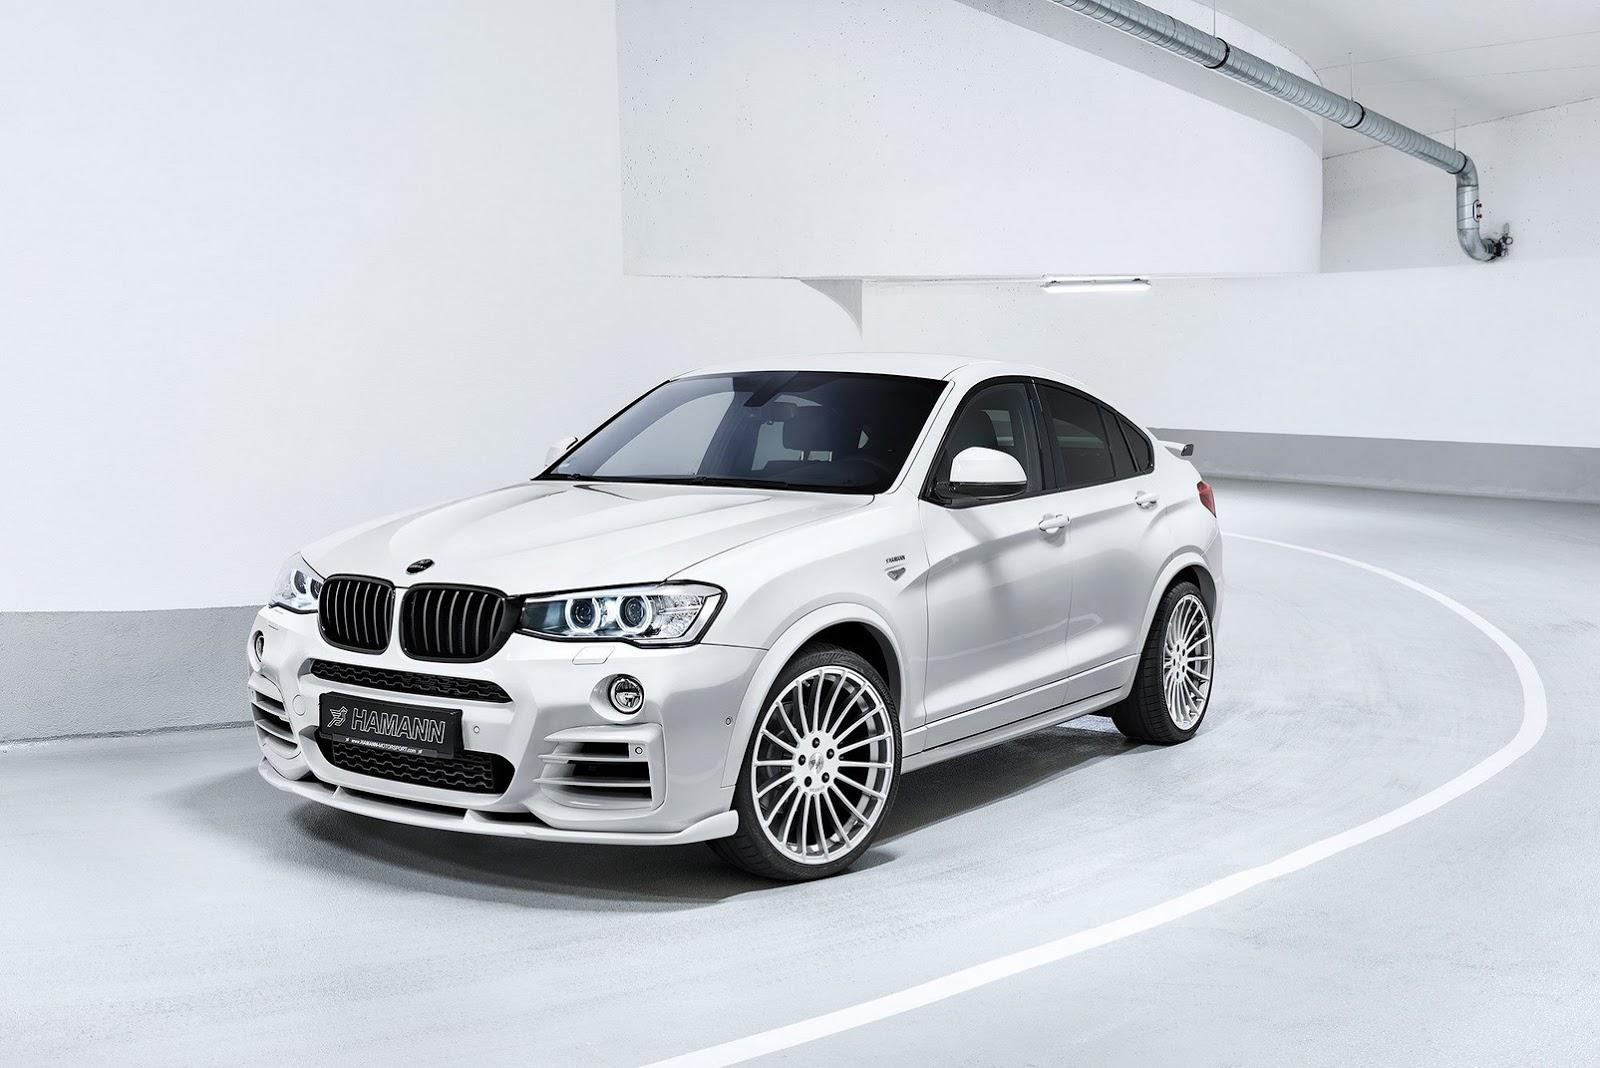 BMW X4 by Hamann (4)